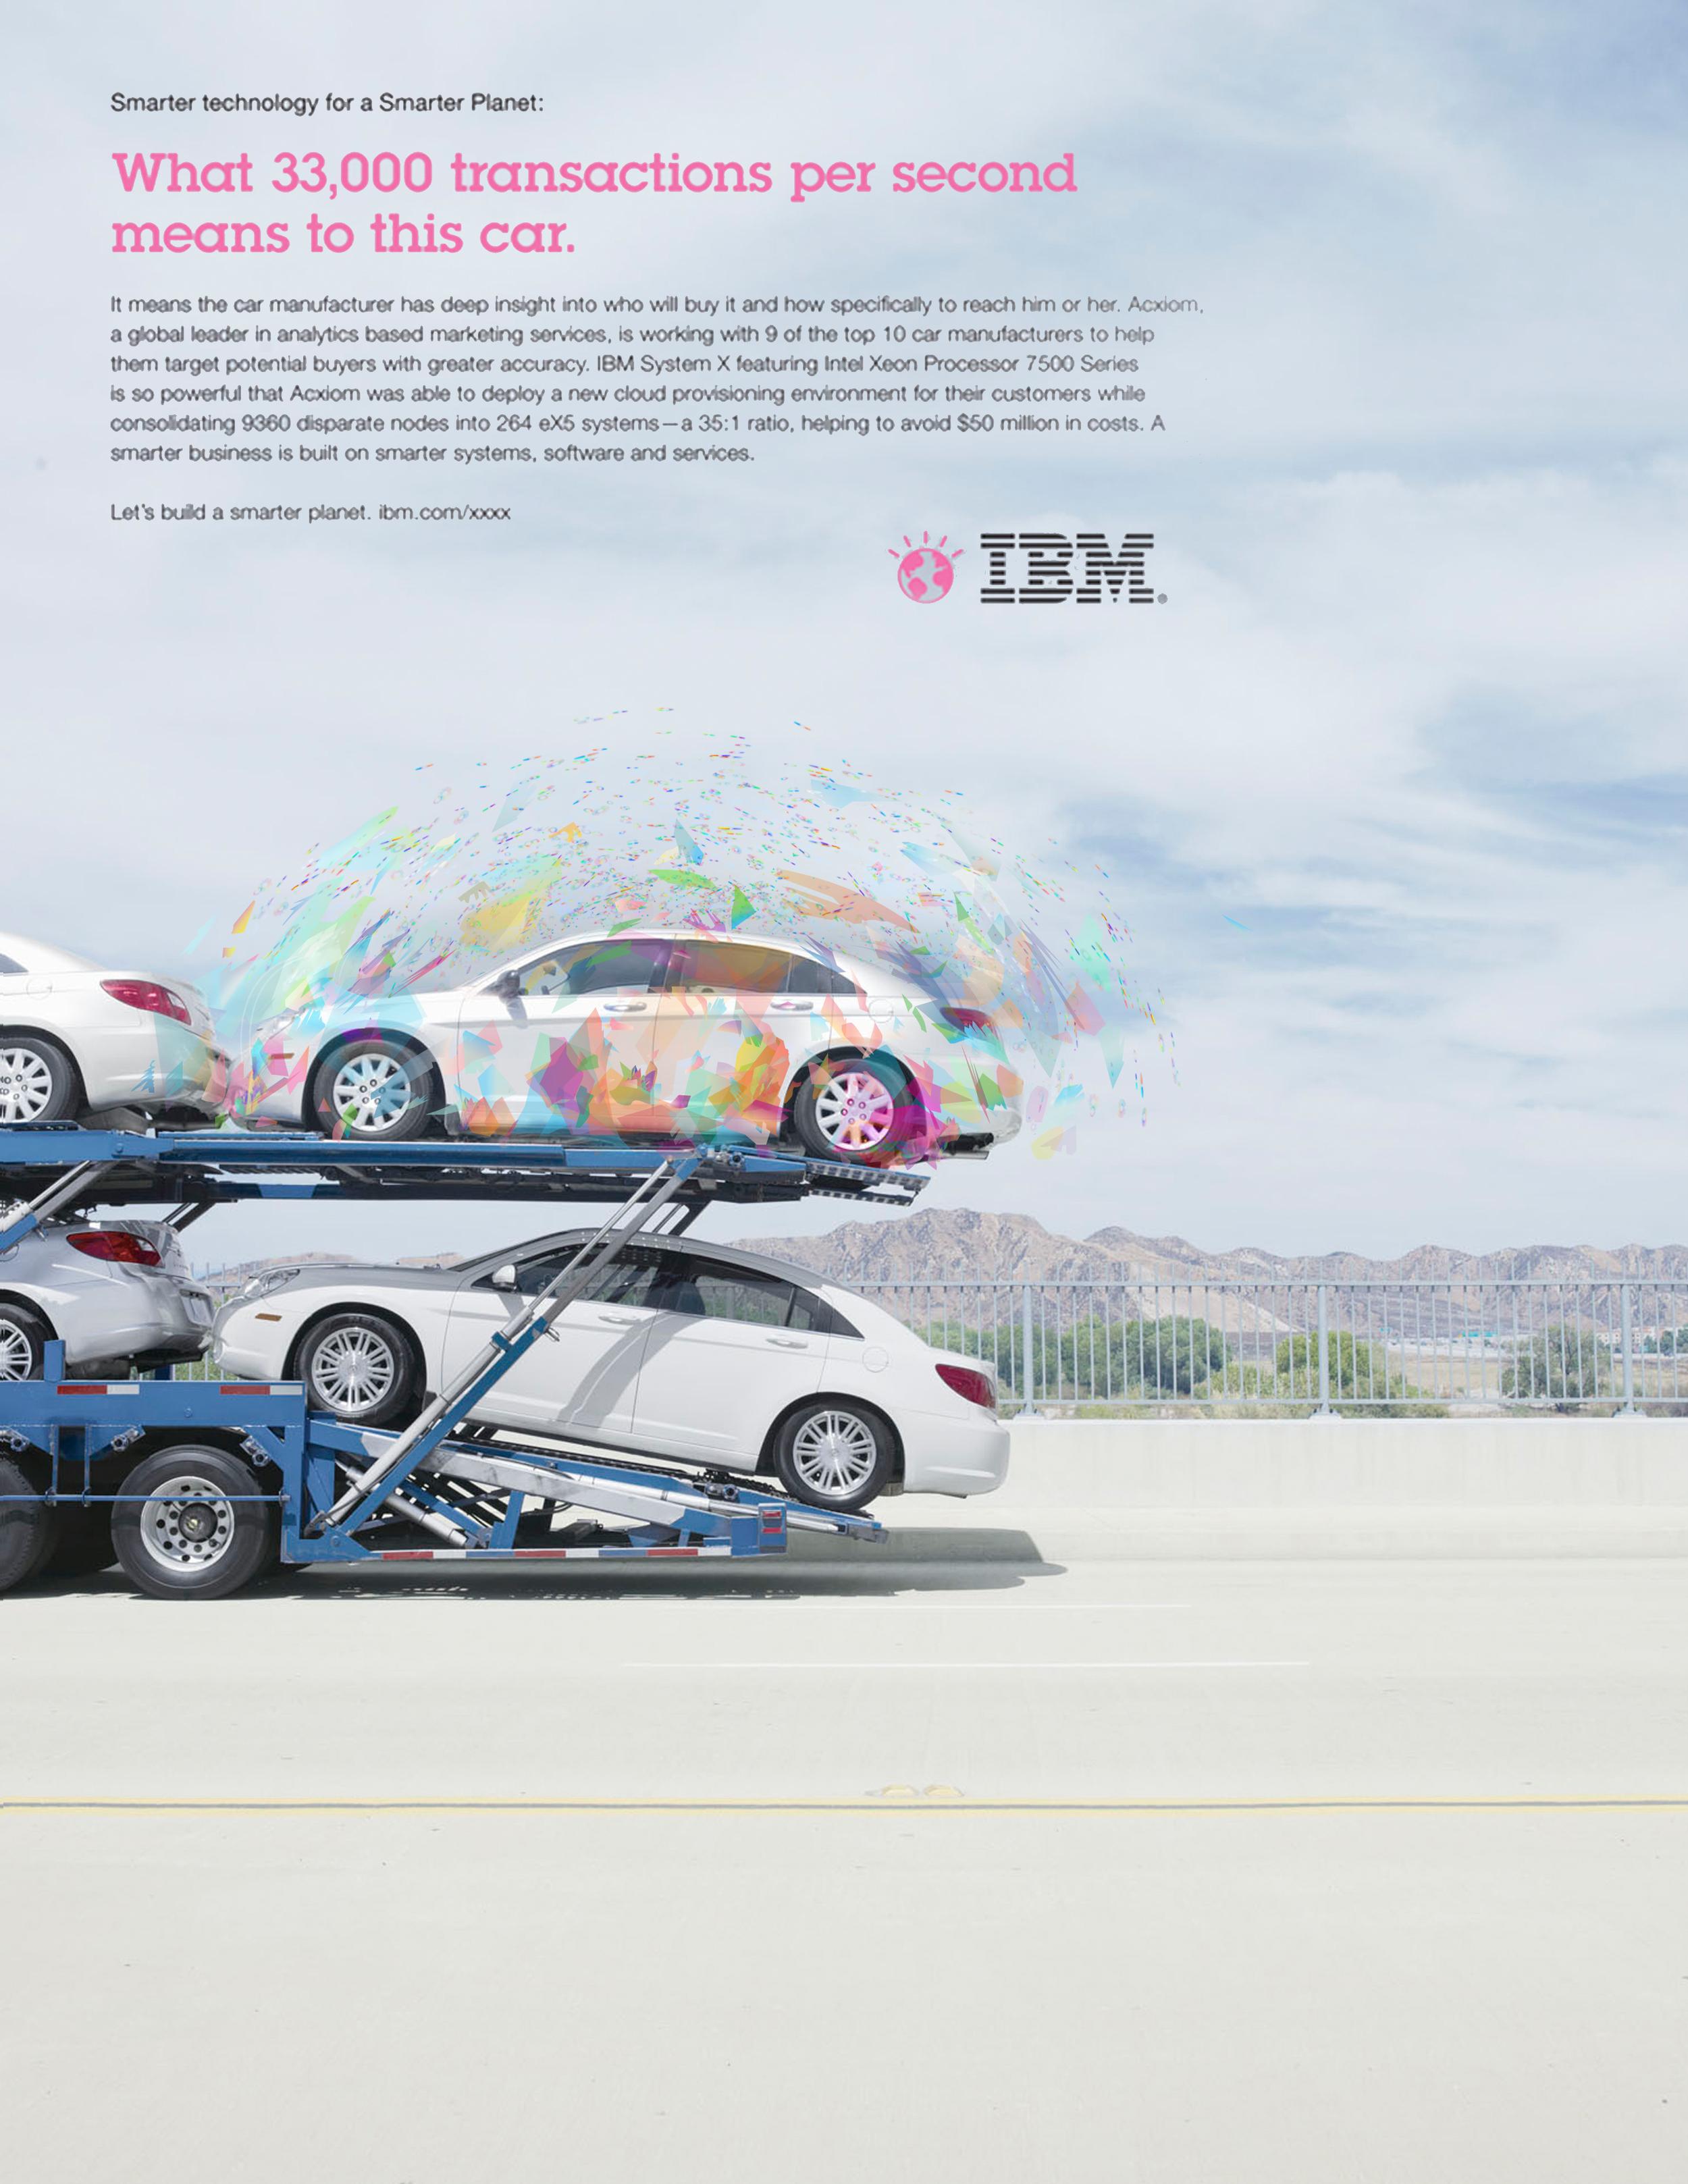 IBM_acxiom_data.jpg